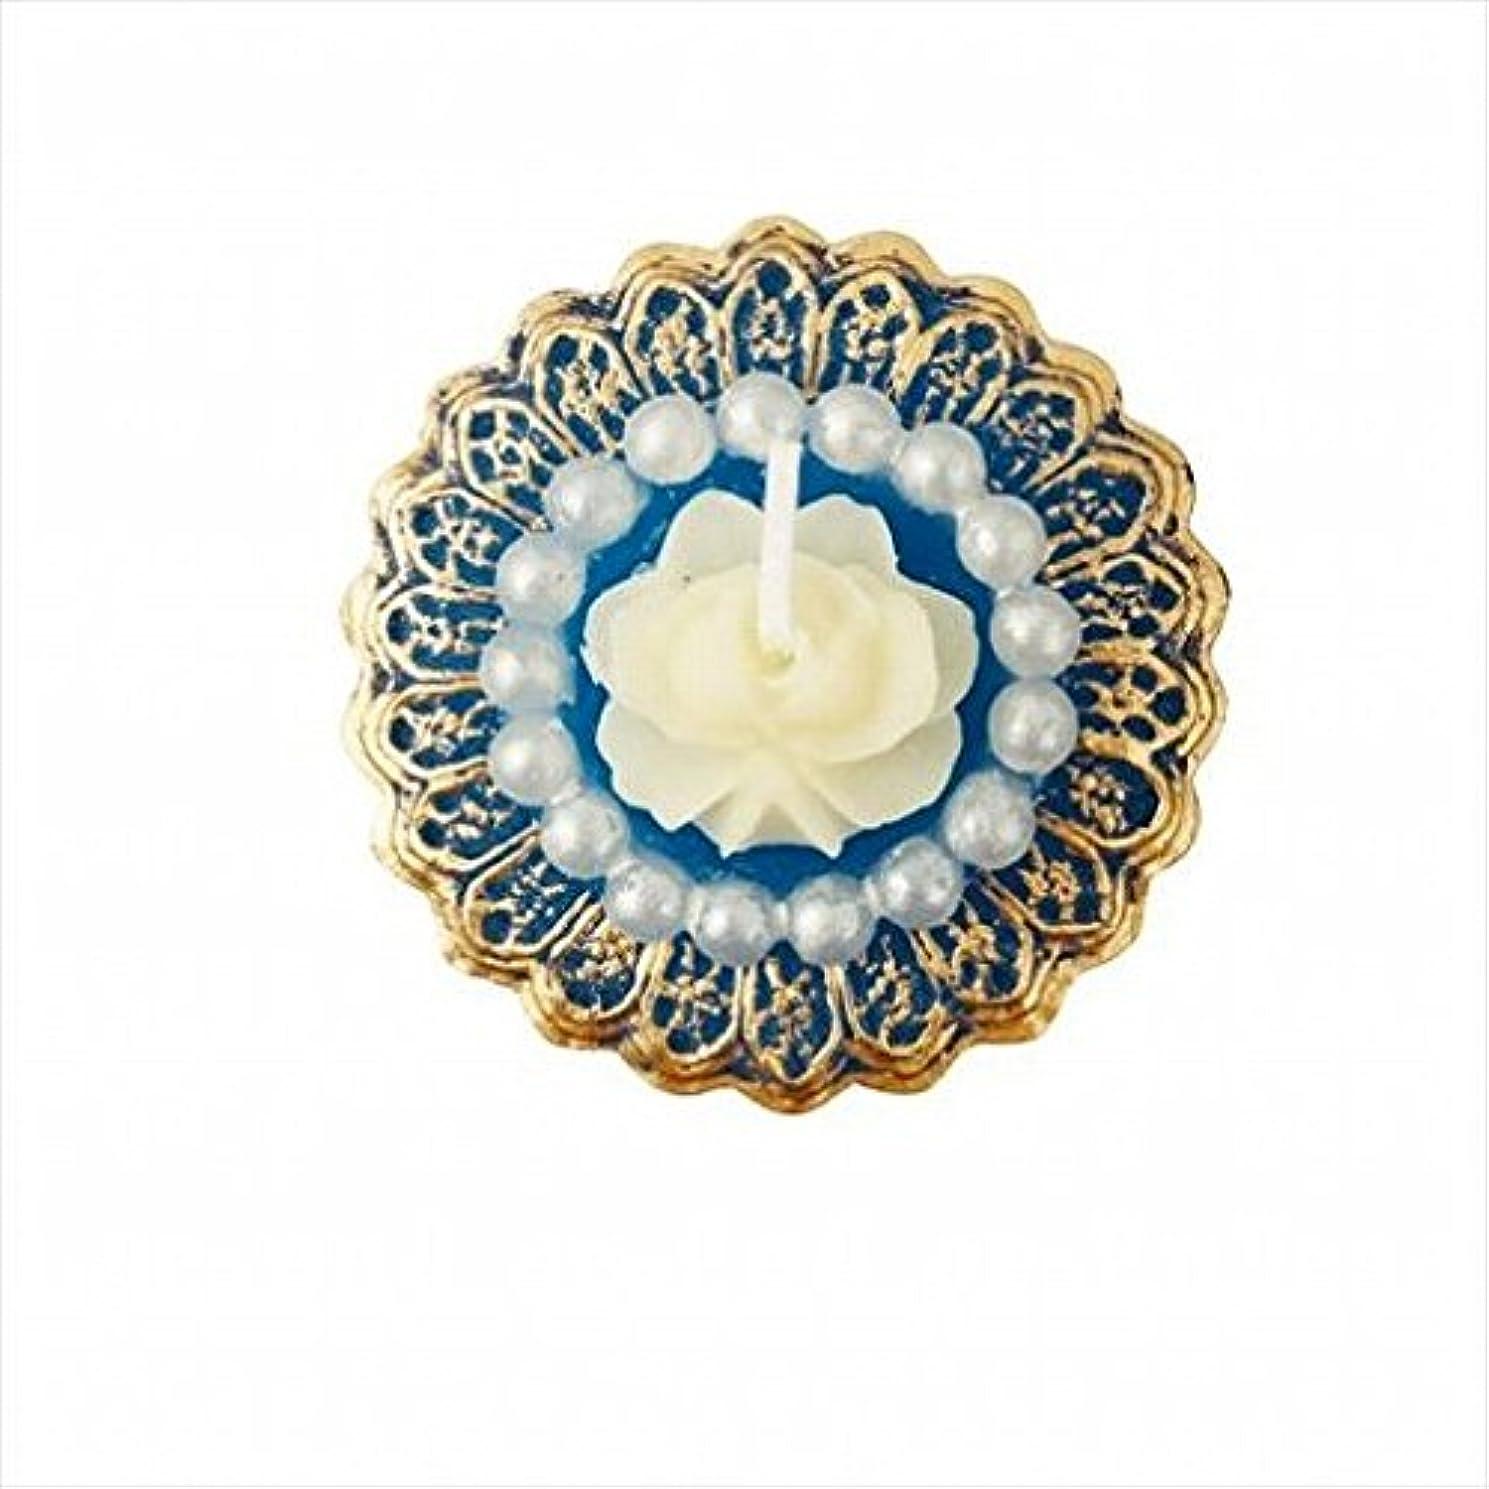 kameyama candle(カメヤマキャンドル) アンティークジュエリー 「 ブルーローズシェル 」 キャンドル 48x48x24mm (A4380020)